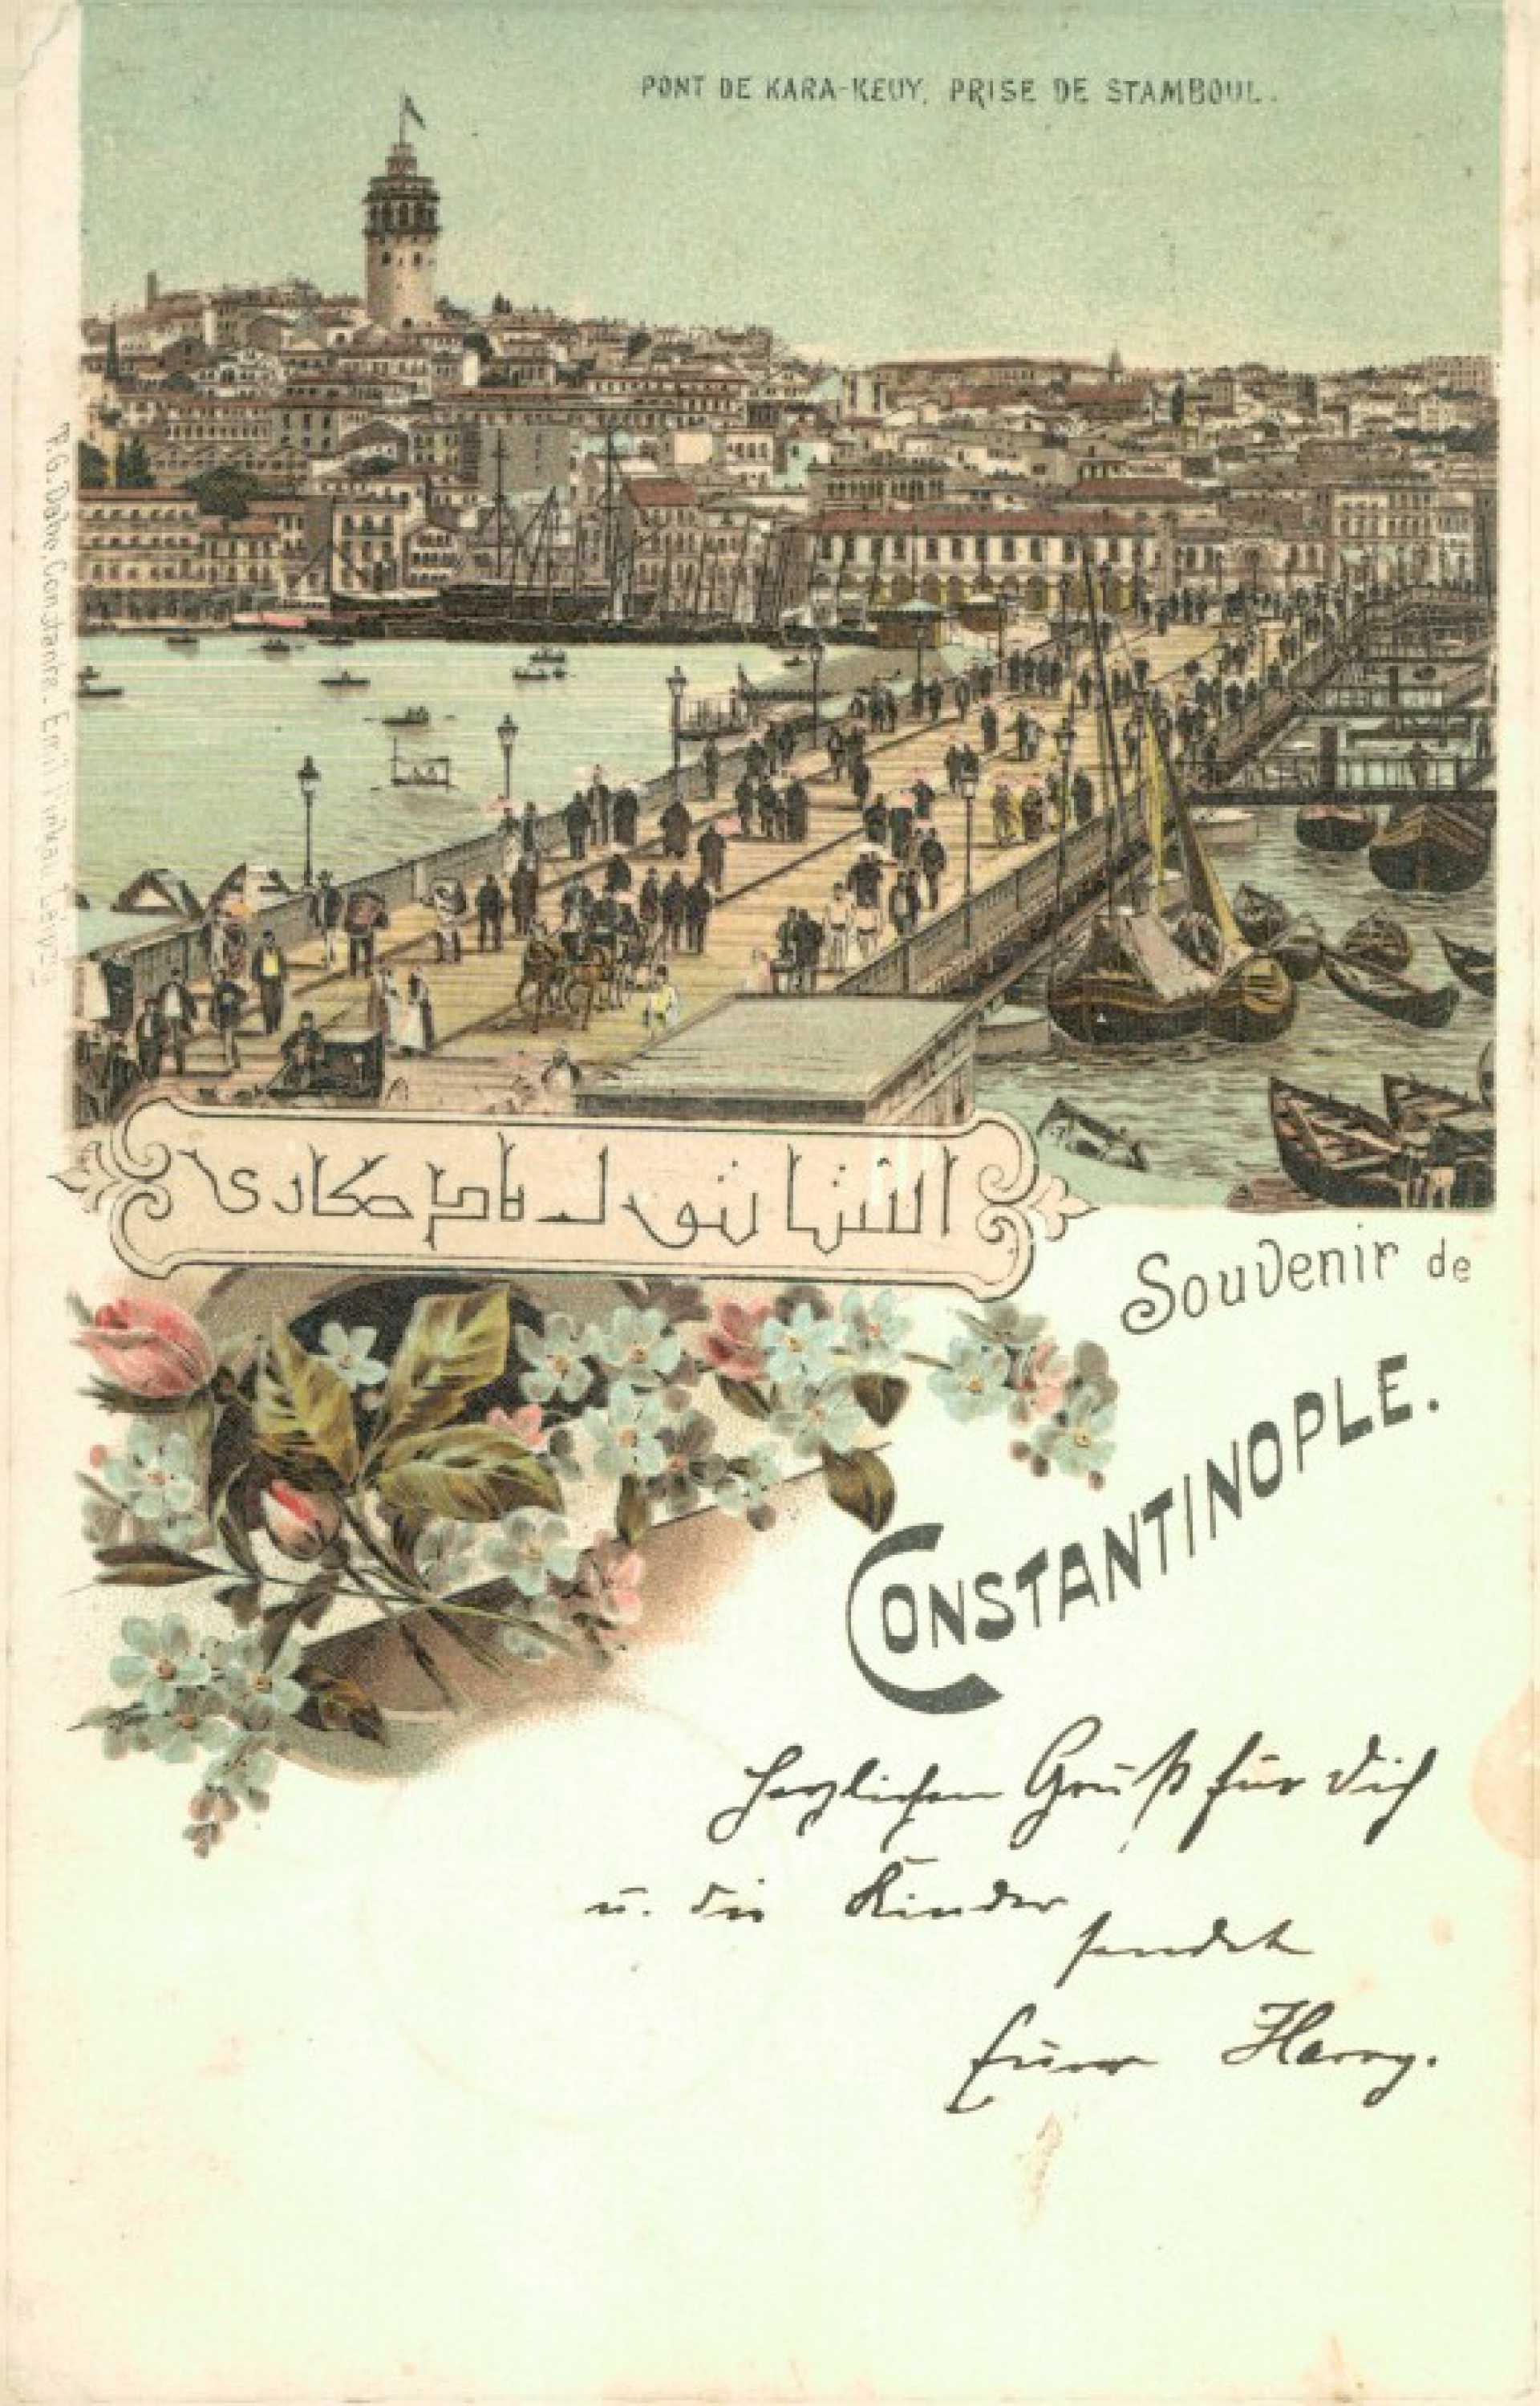 Pont de Kara-keuy. prise de Stamboul